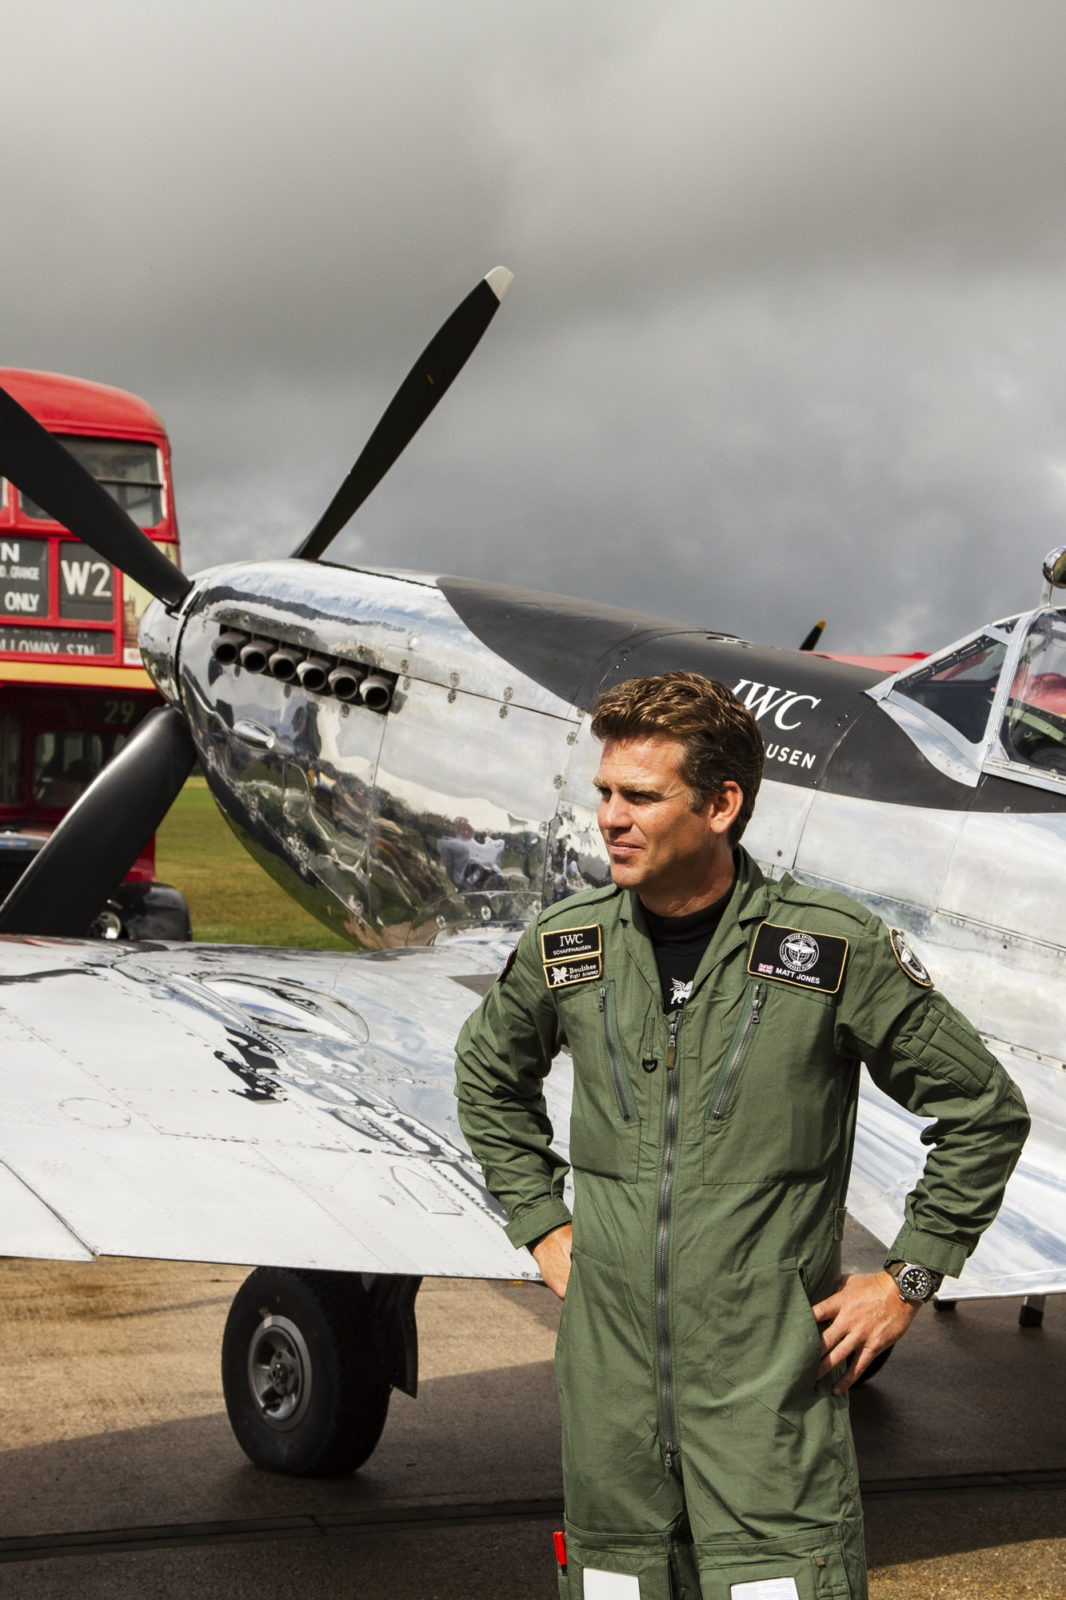 IWC The Longest Flight - Matt Jones